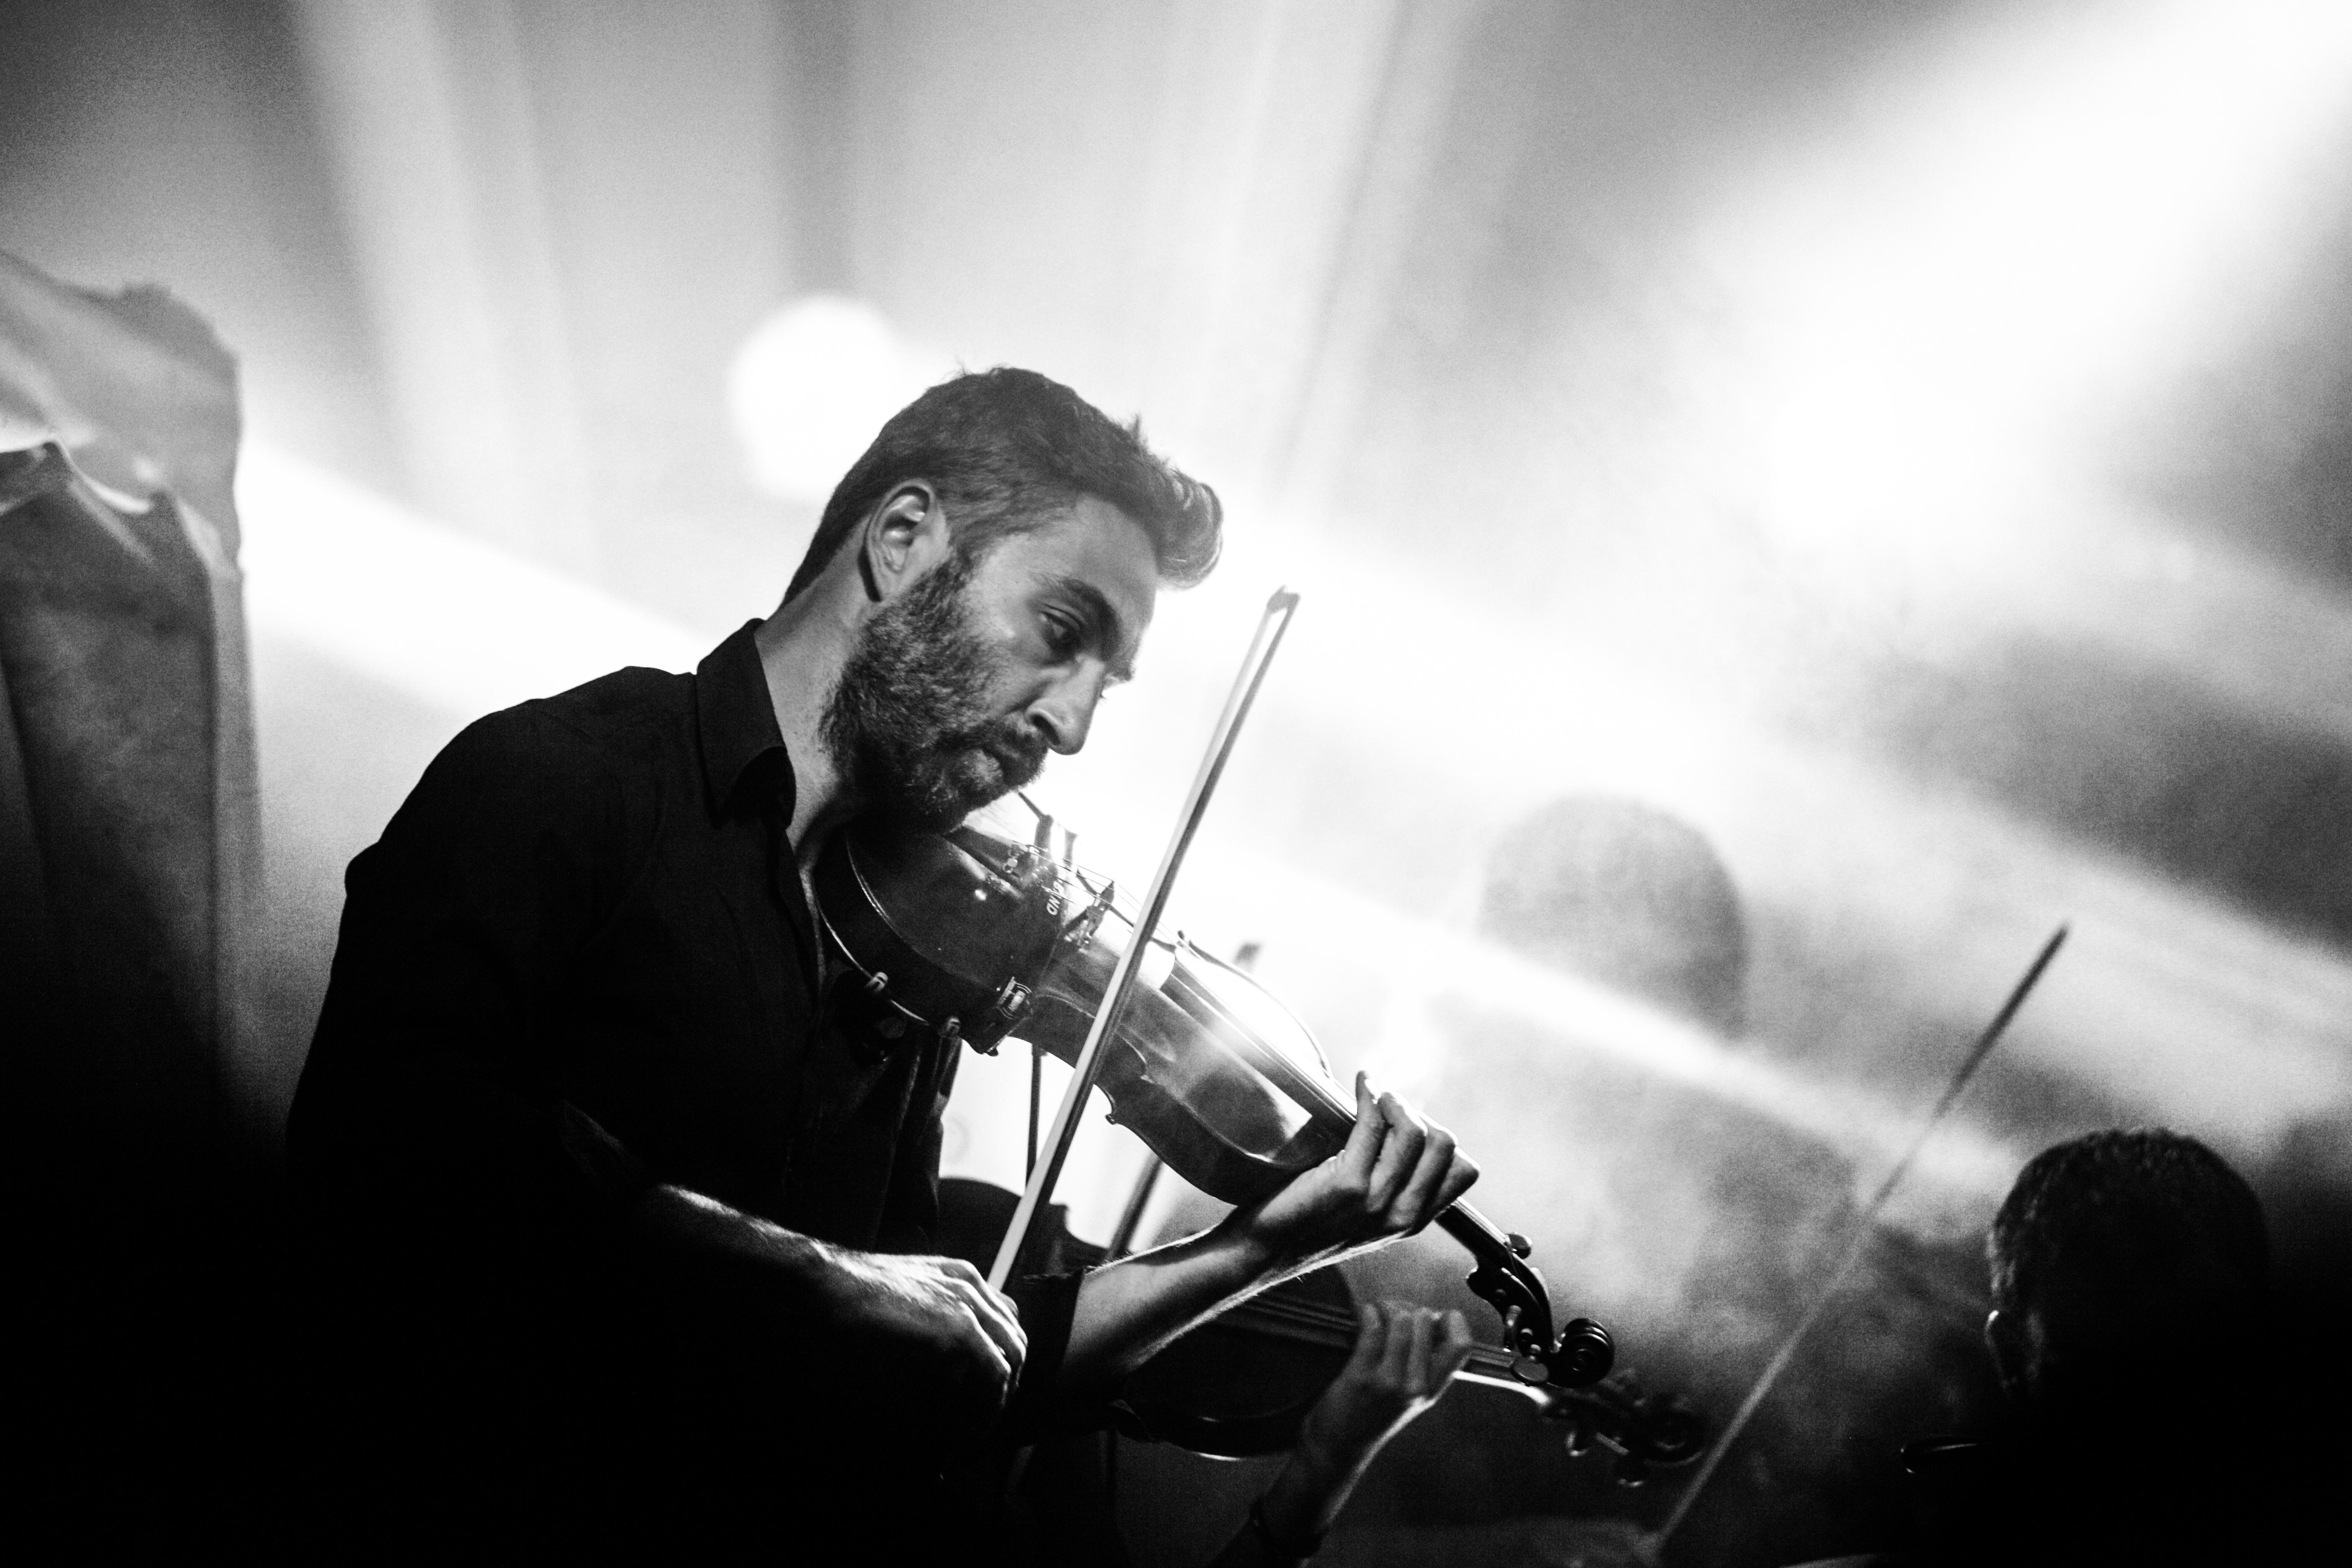 Greyscale Photography of Man Playing Violin